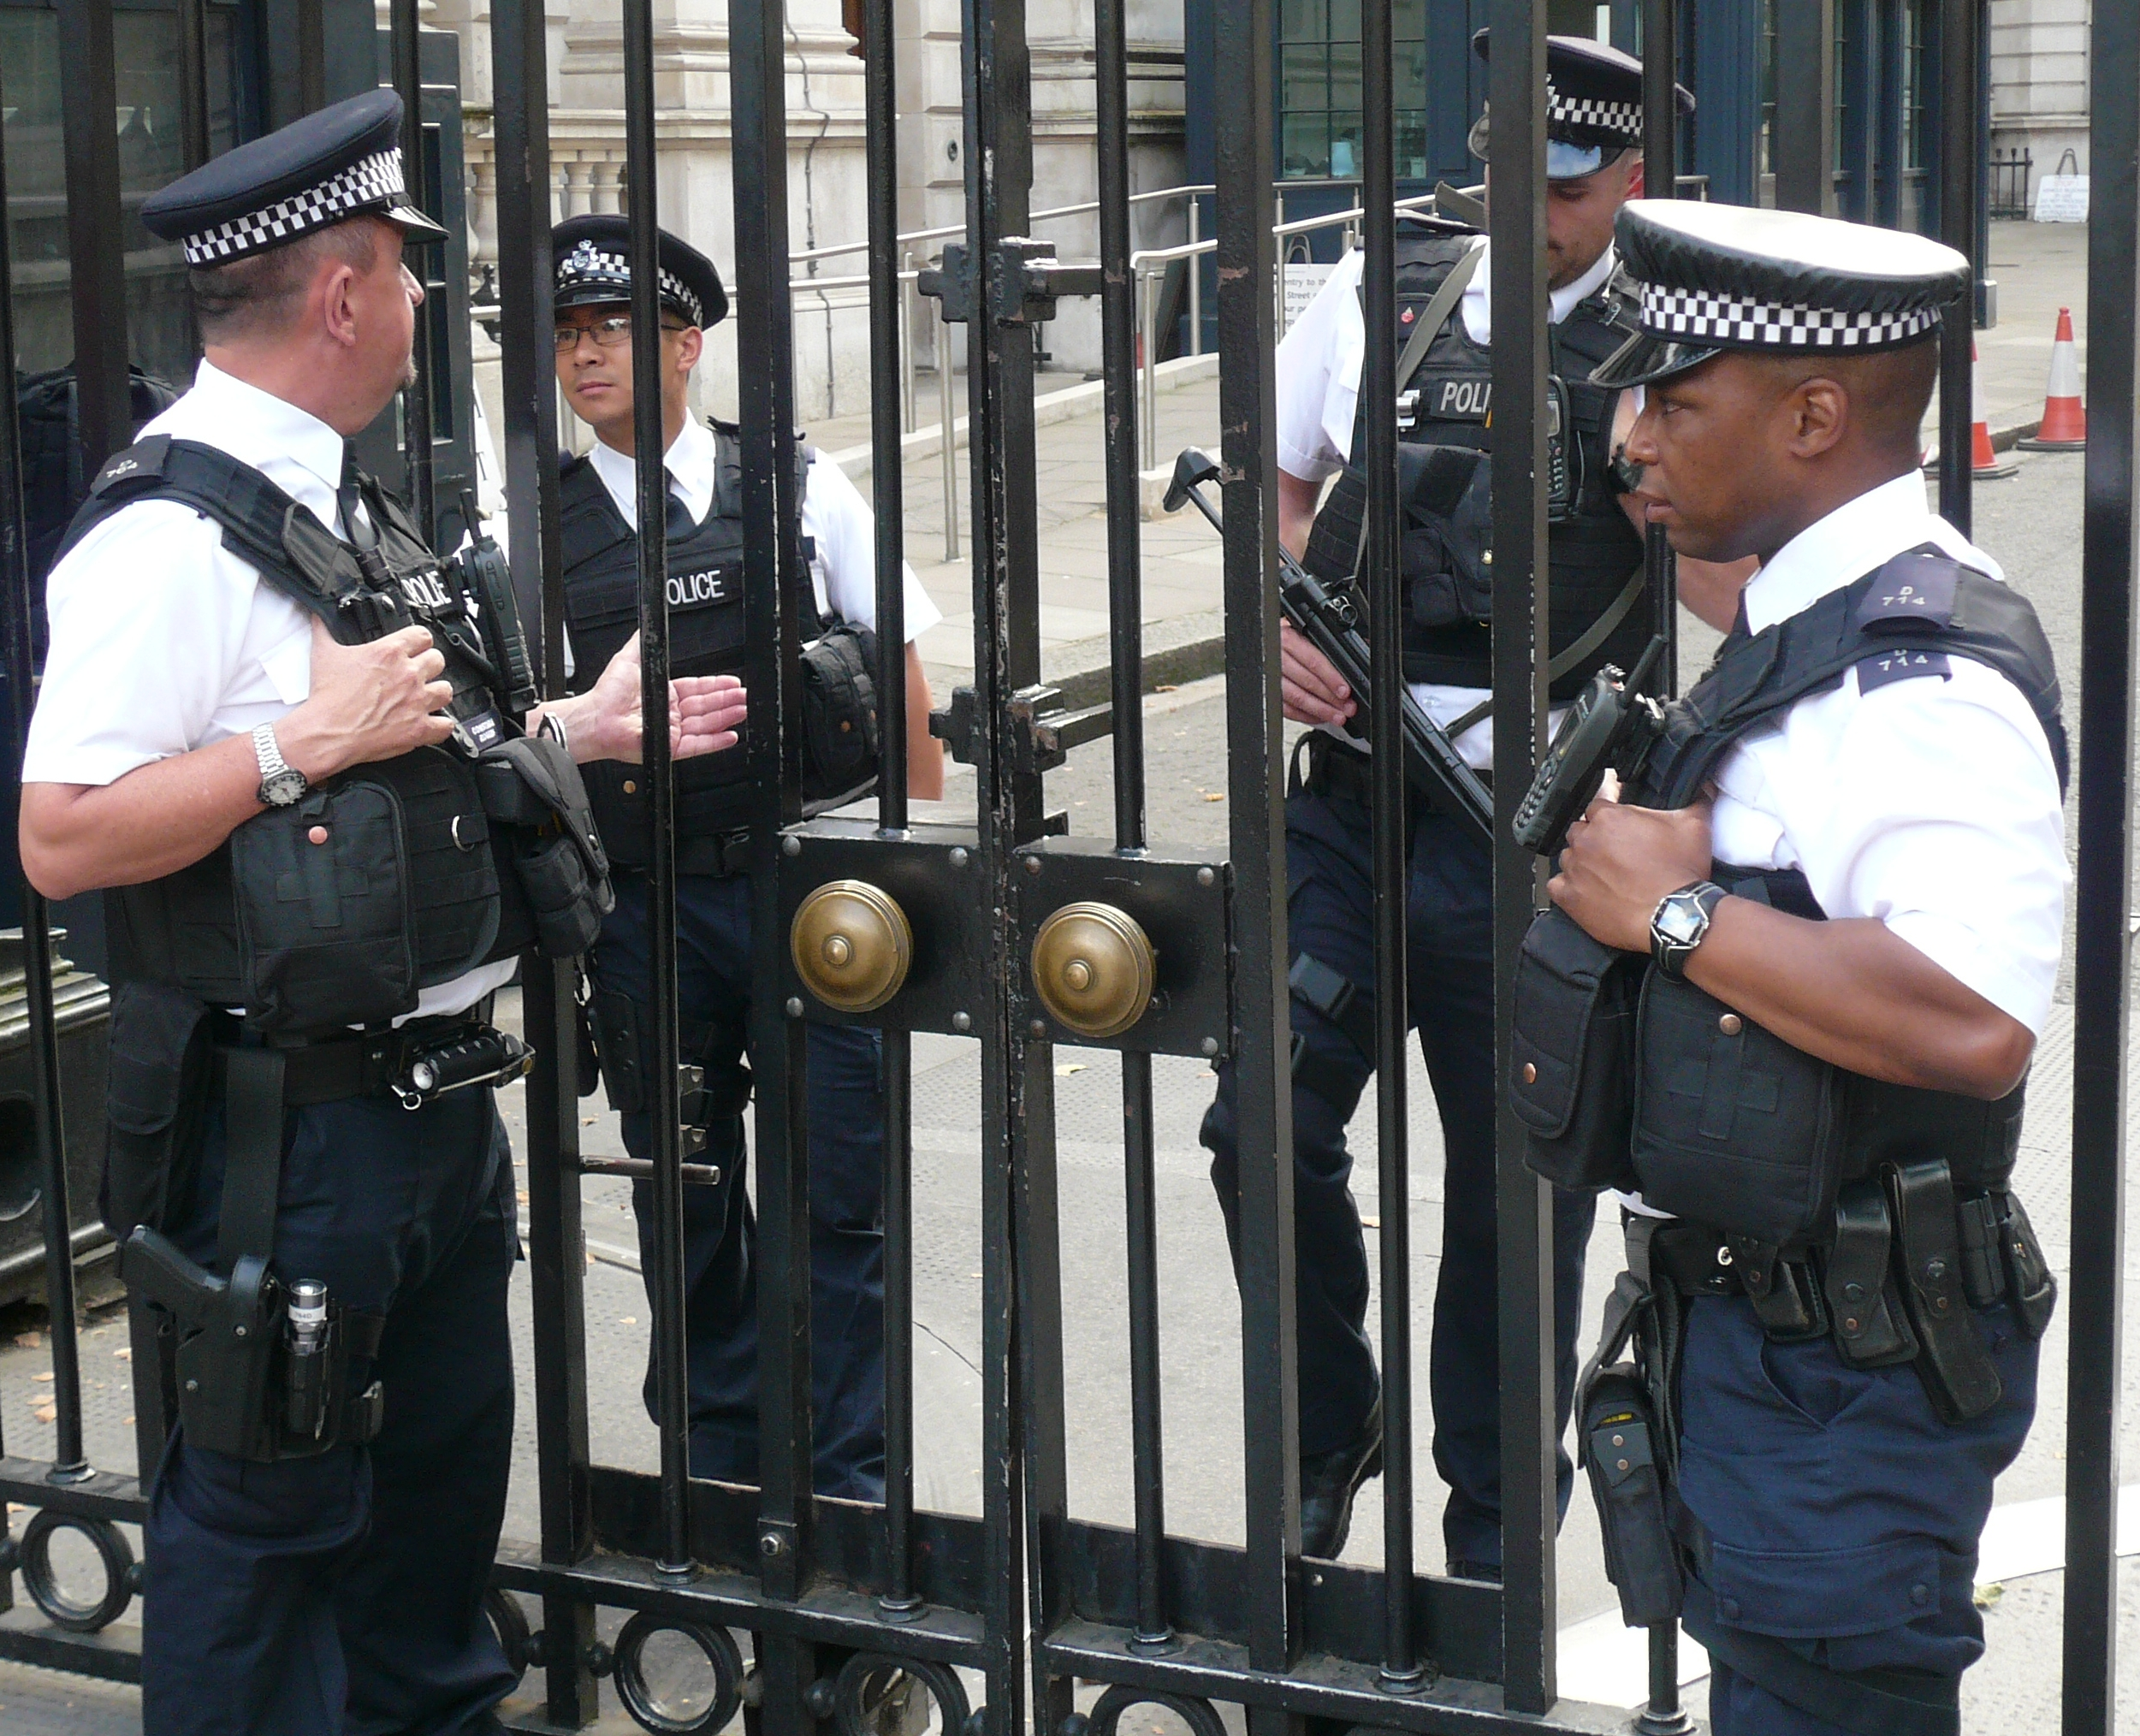 Security Equipment: List Of Security Equipment